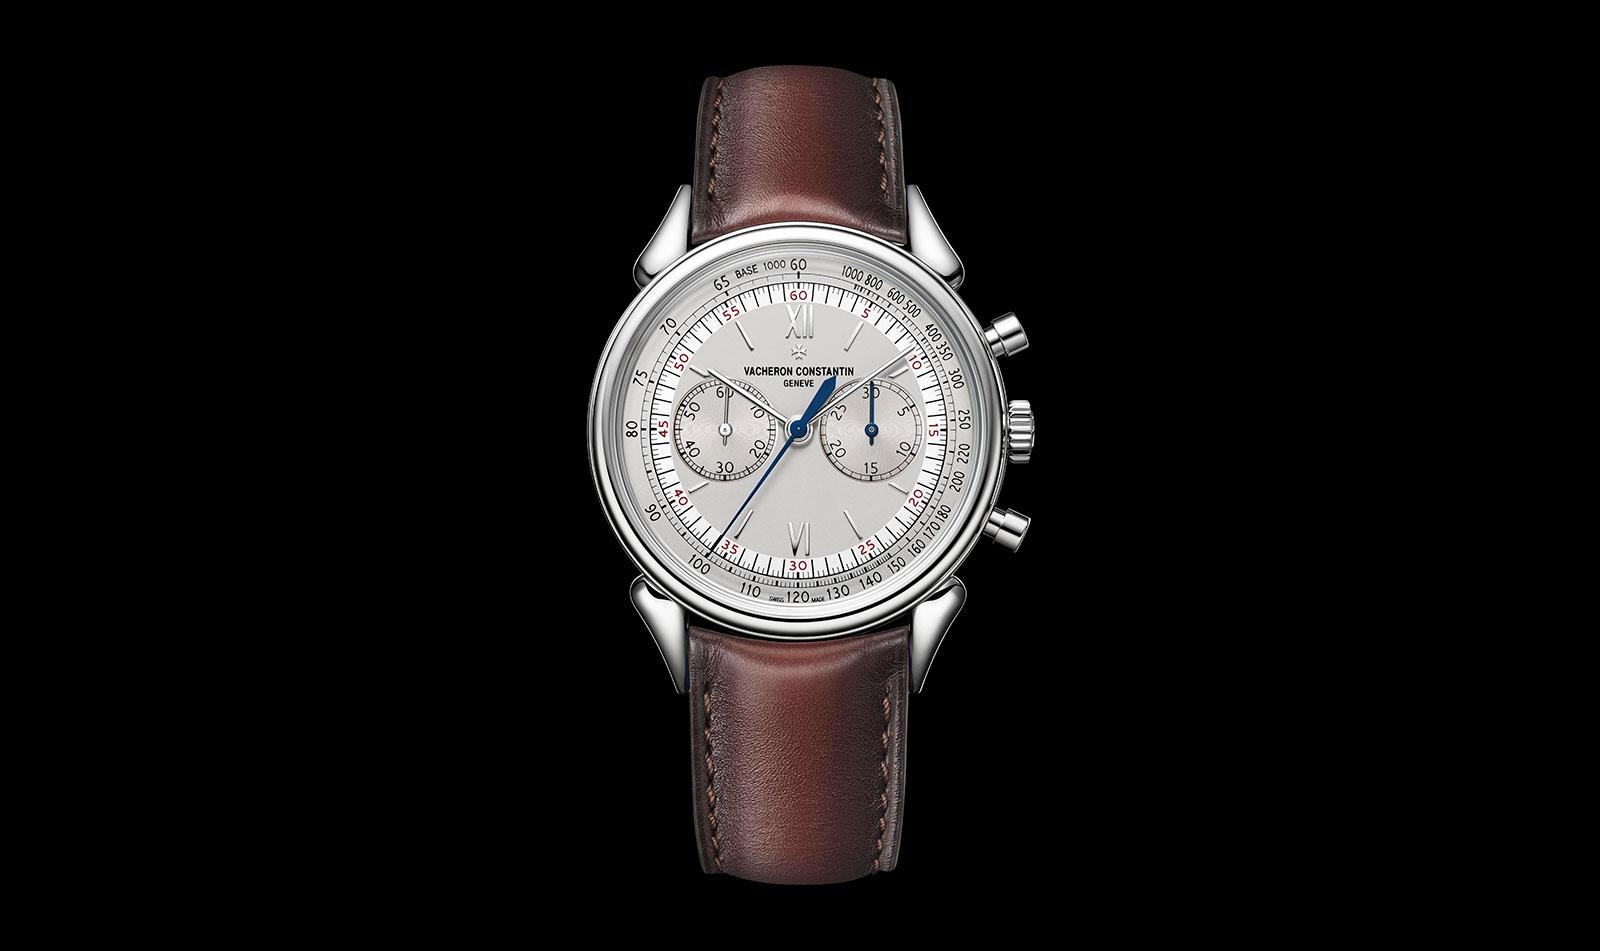 Vacheron Constantin Introduces the Cornes de Vache Chronograph in Steel | SJX Watches